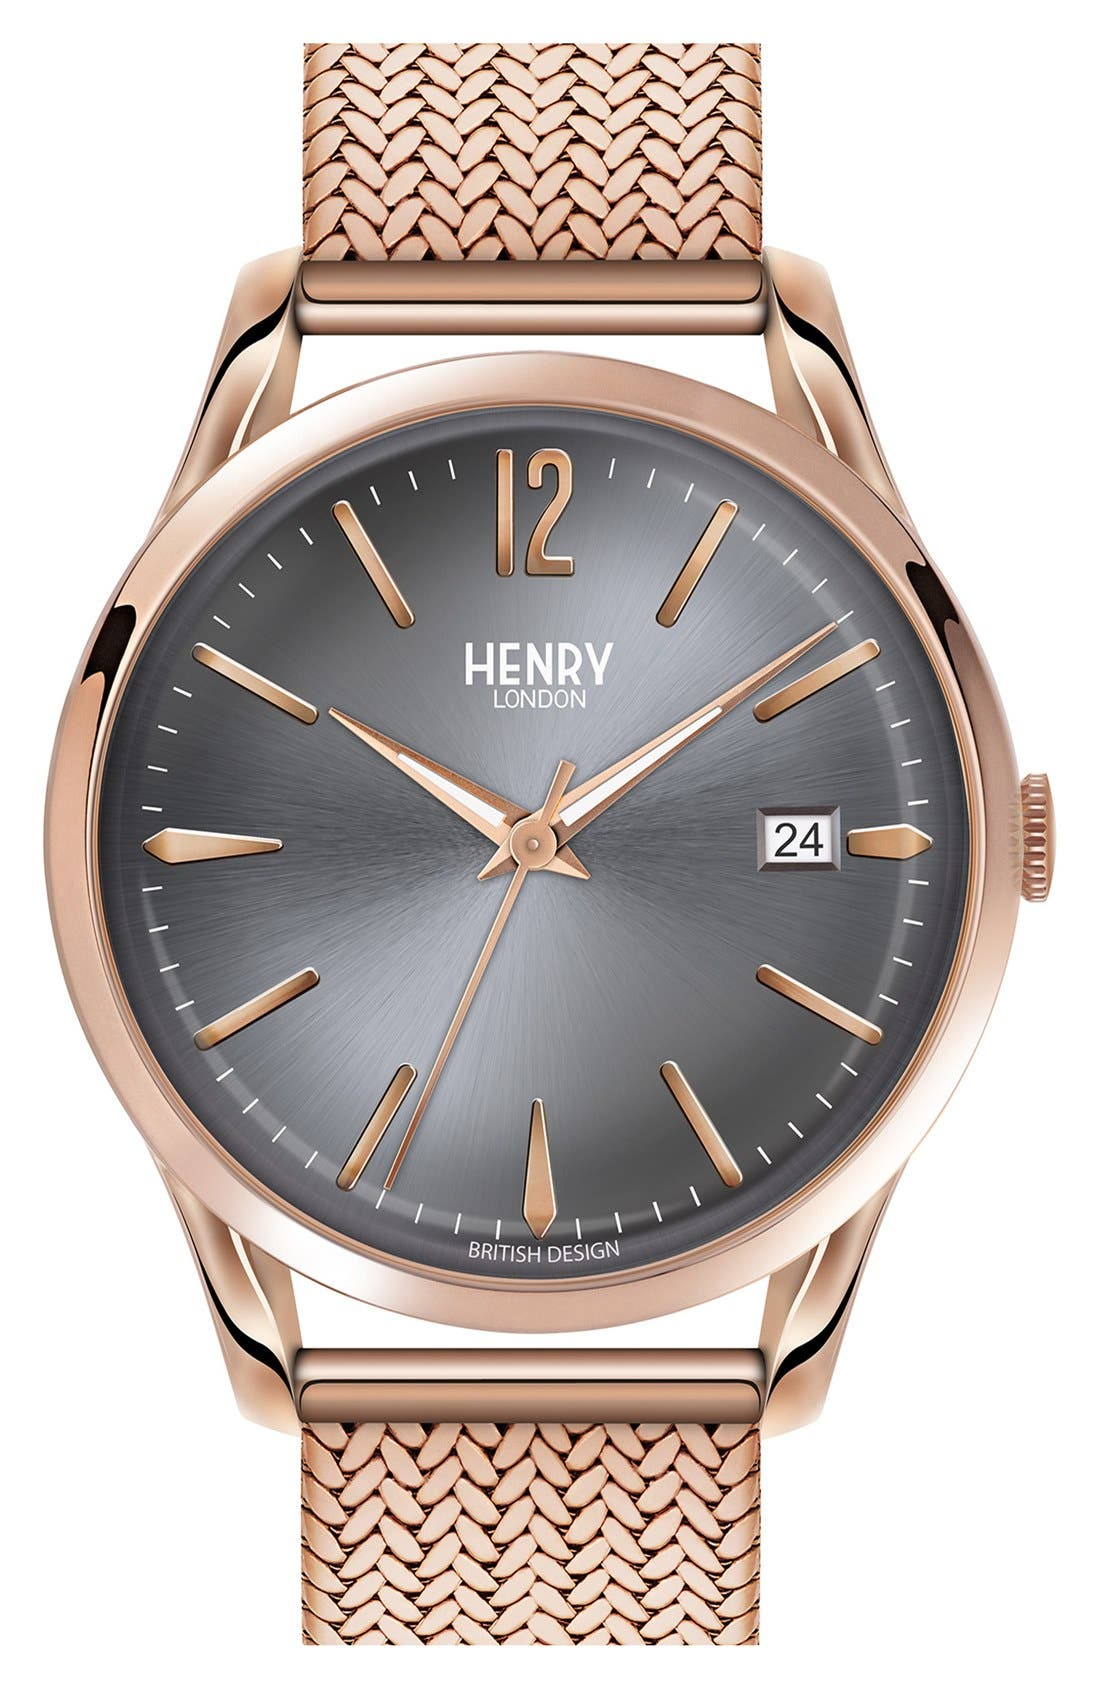 HENRY LONDON 'Finchley' Analog Mesh Strap Watch, 38Mm in Rose Gold/ Slate Grey